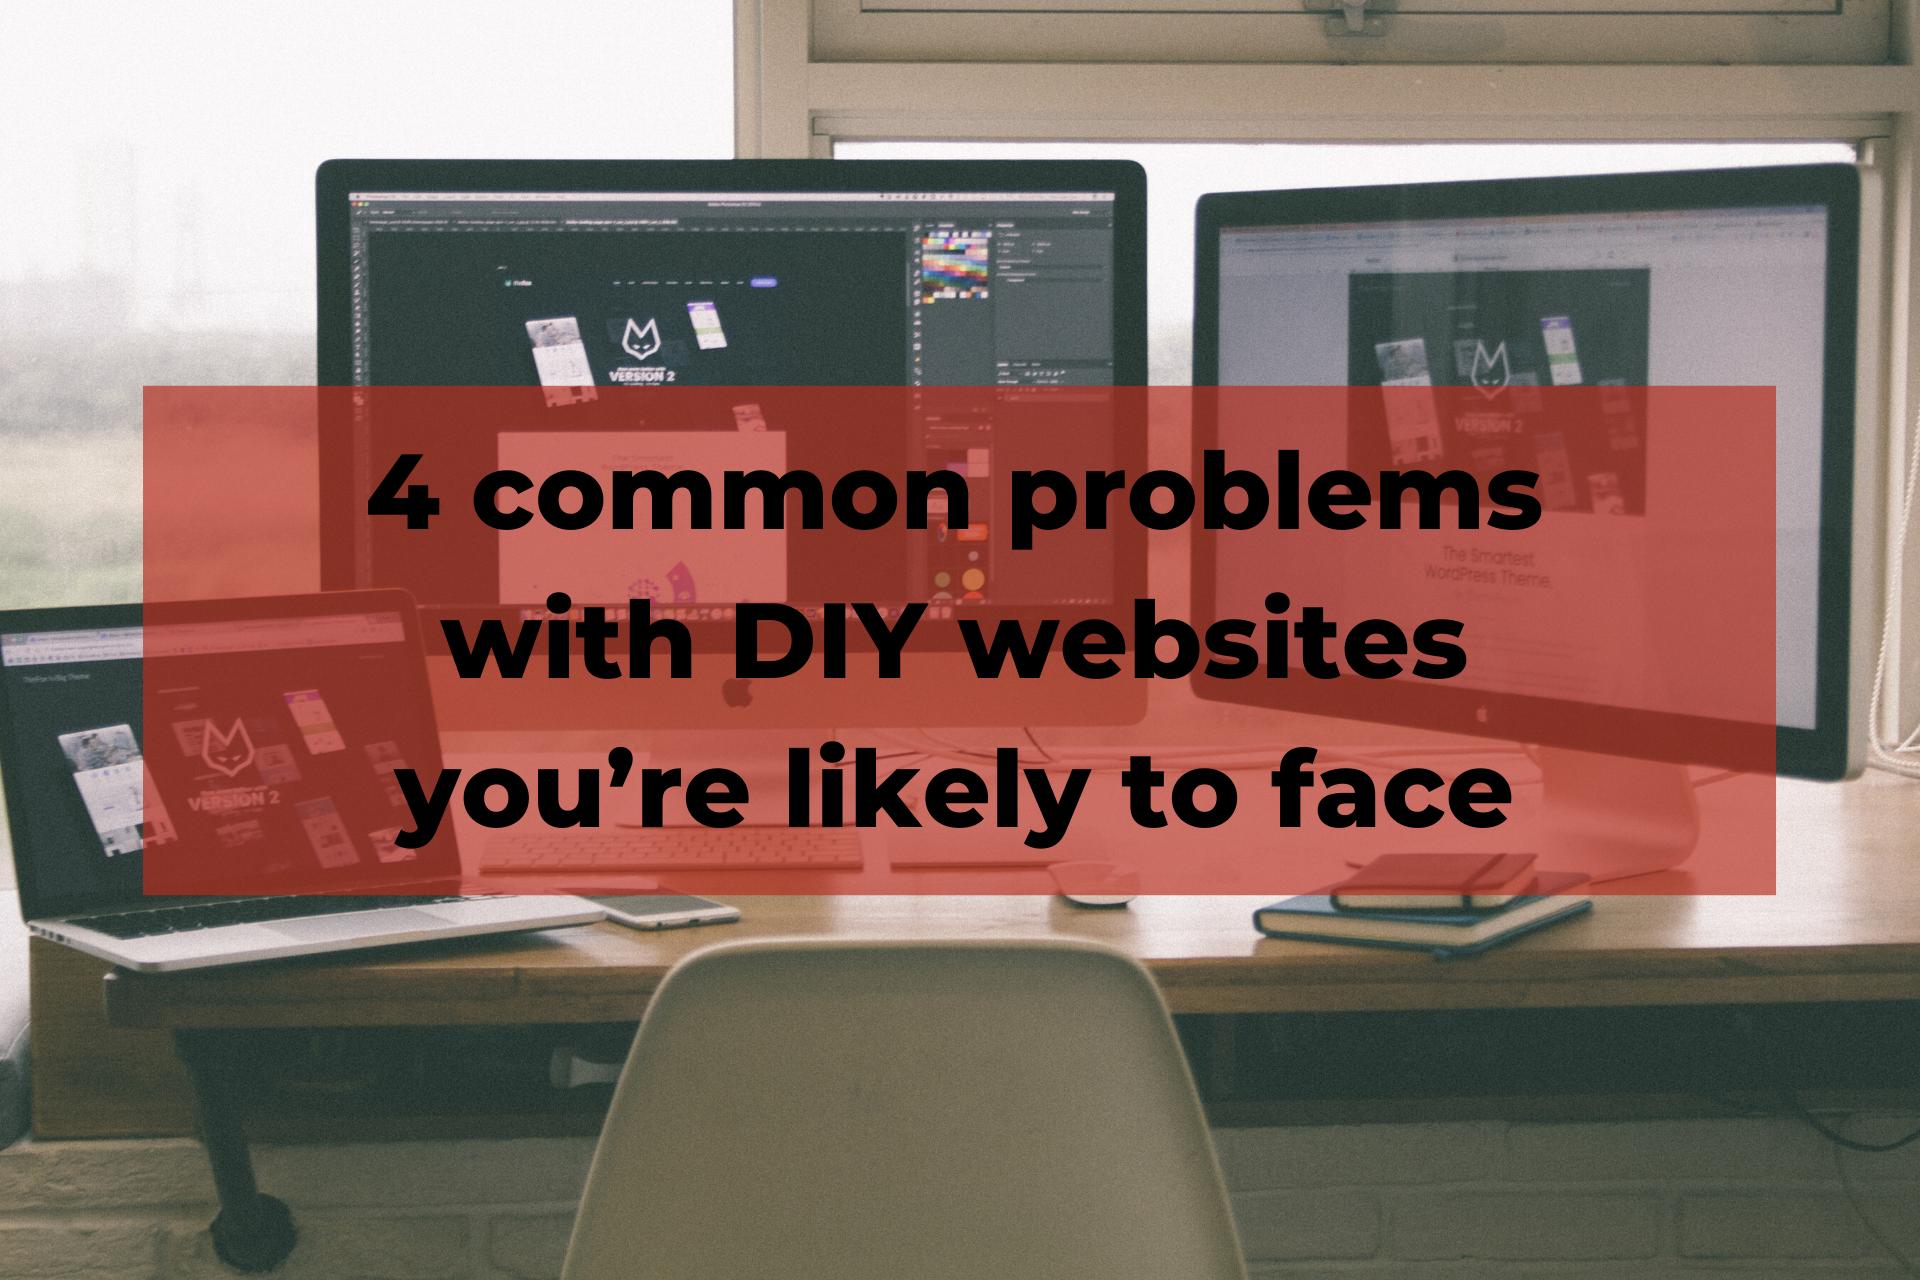 Problems with DIY websites